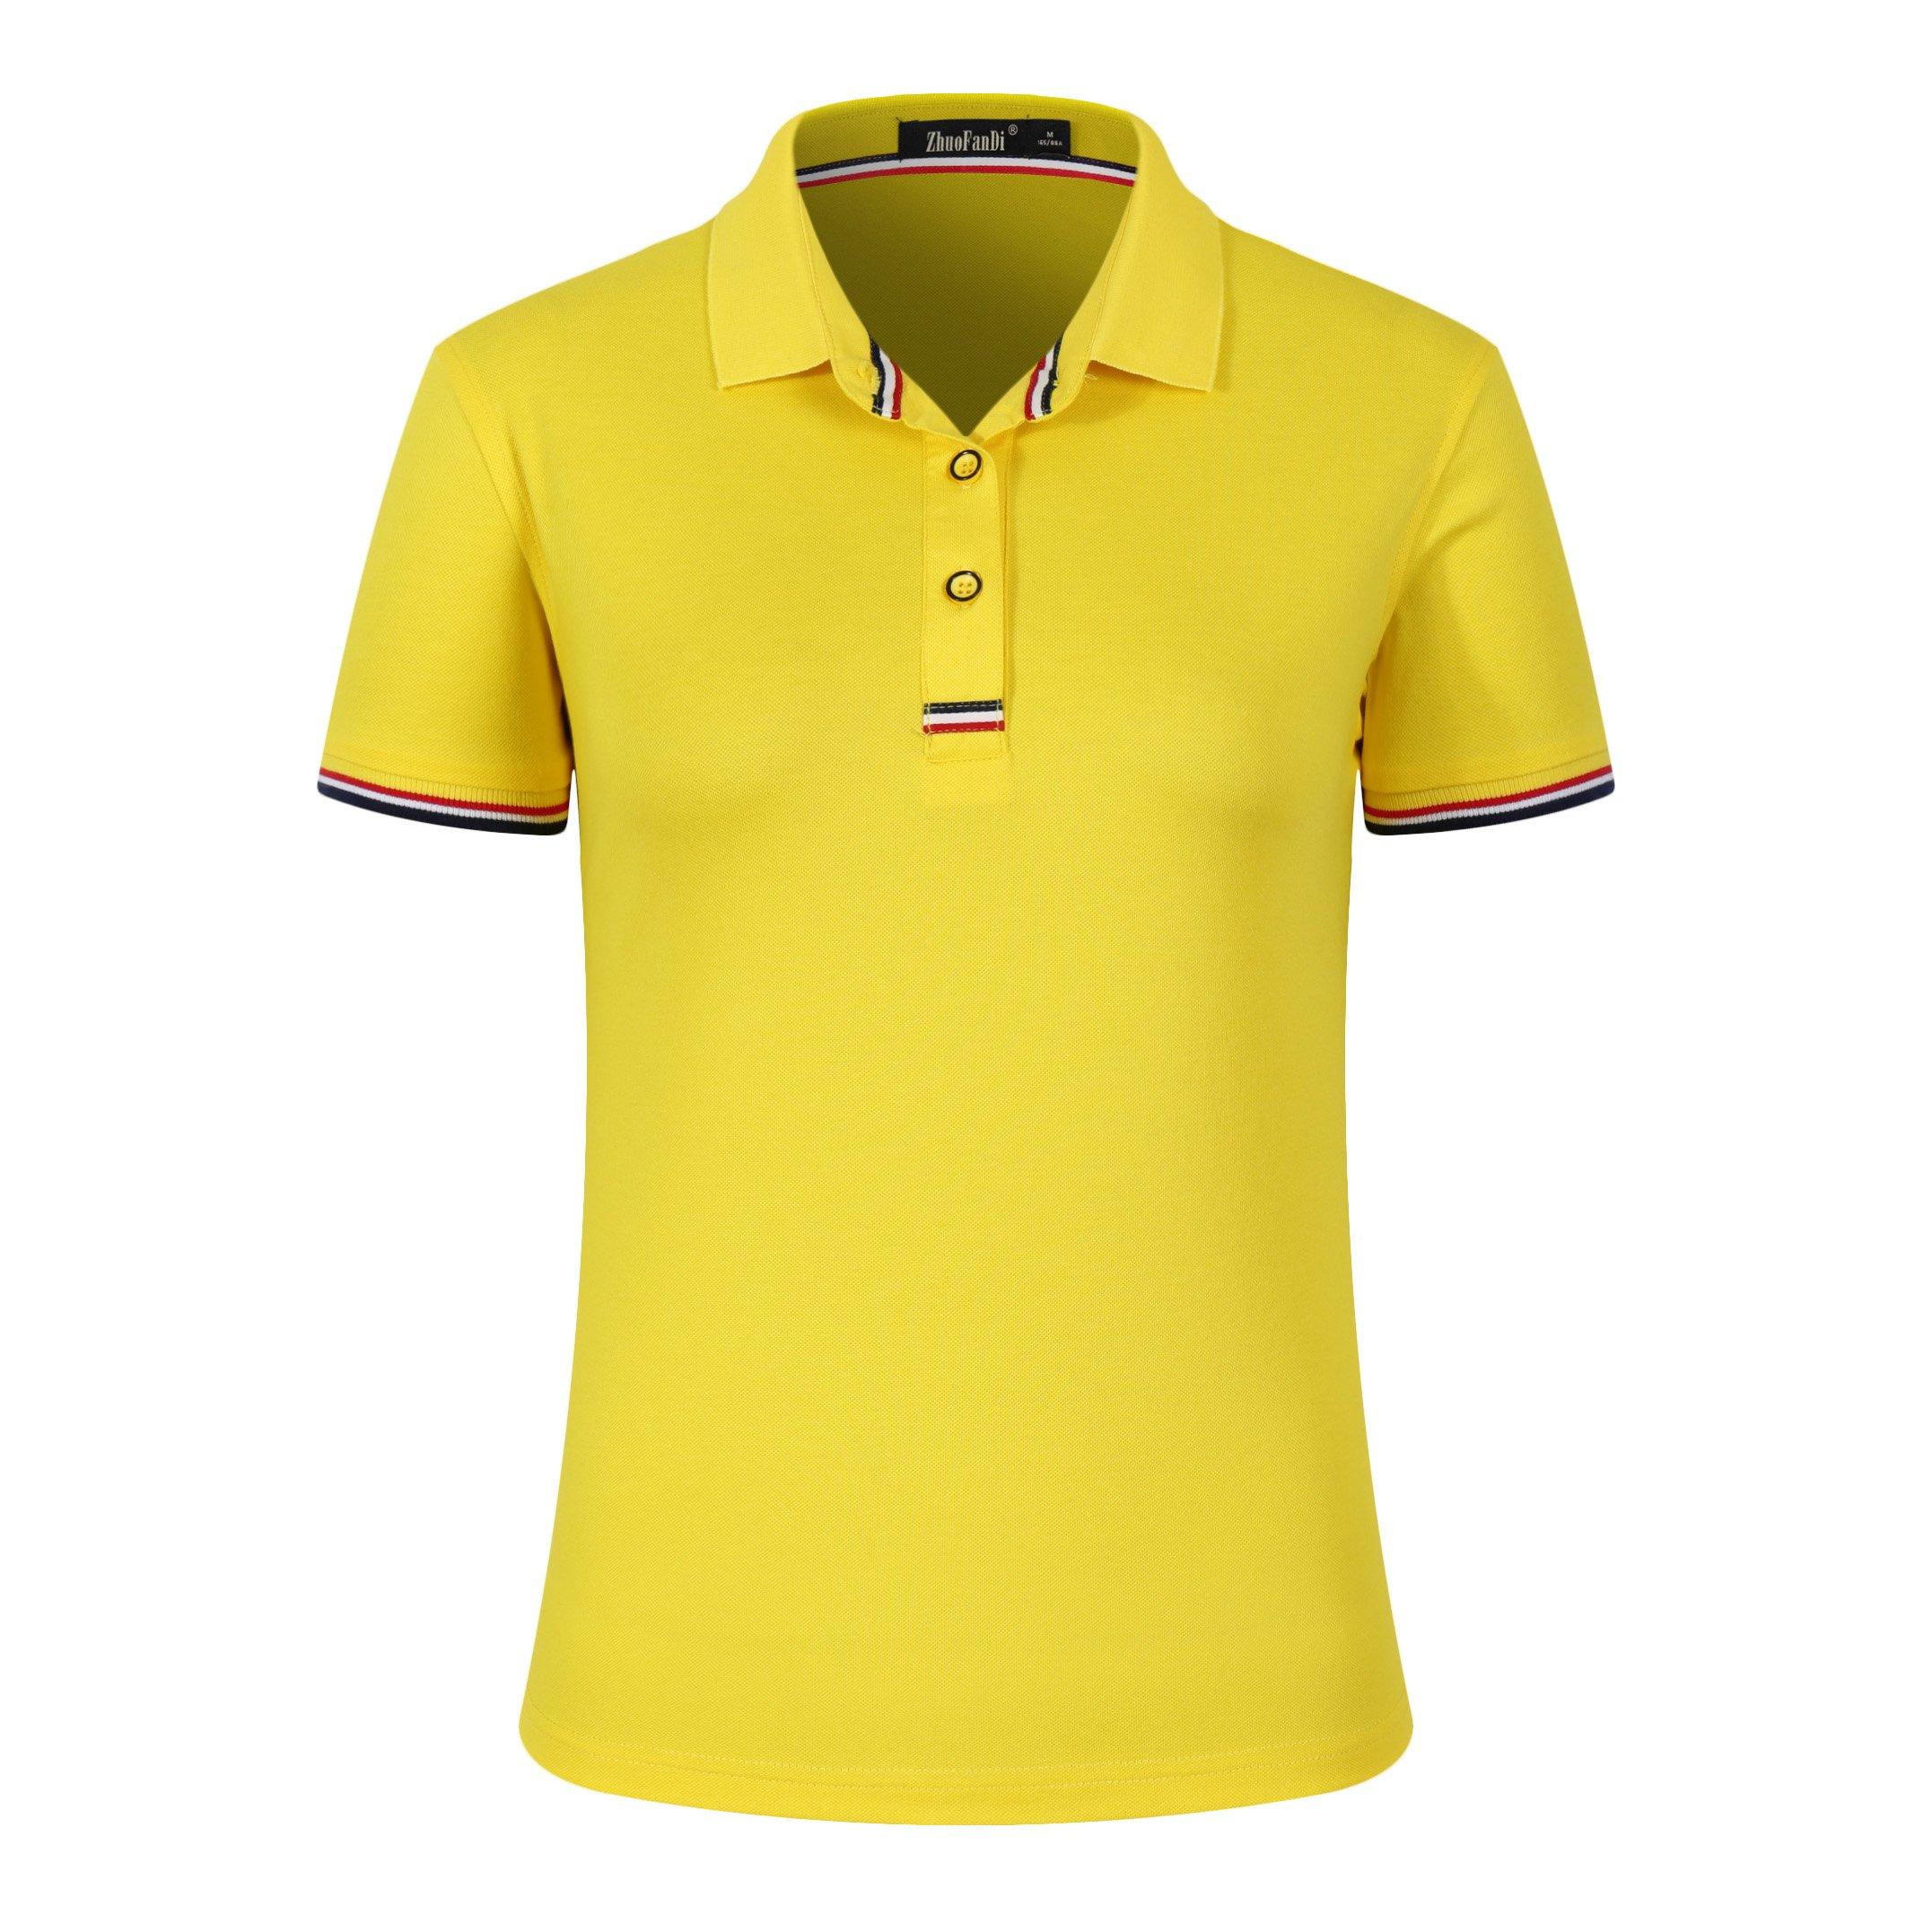 Mitario Femiego Women Classic Rainbow Collar Slim Fit Short Golf Polo Shirt Yellow S